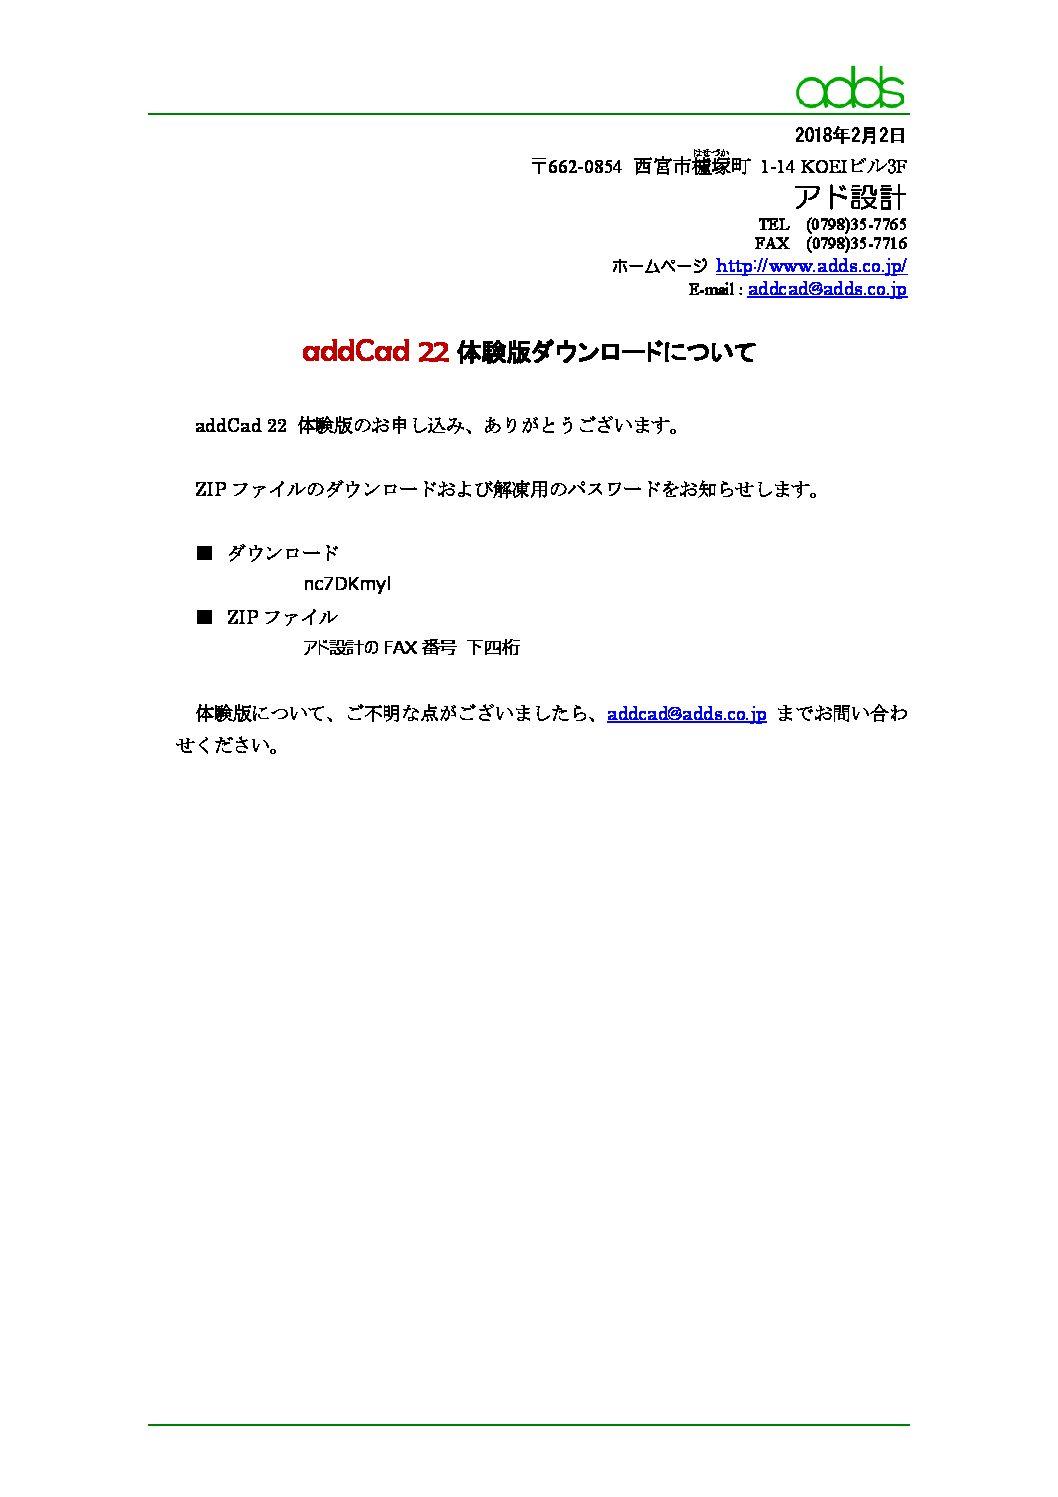 addCad | 建築向け2D CAD | アド設計